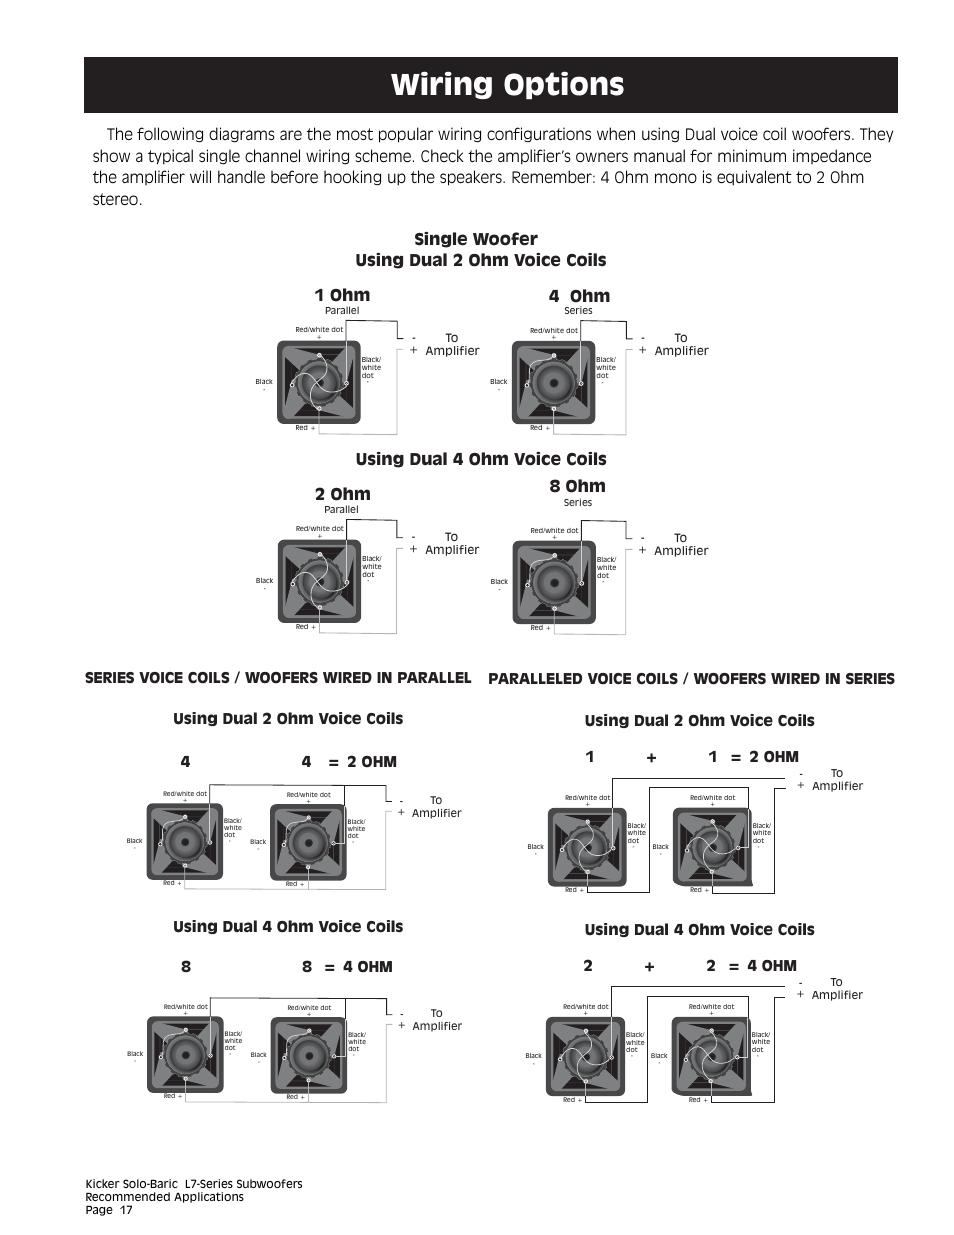 Dual 1 Ohm Wiring Diagram from schematron.org